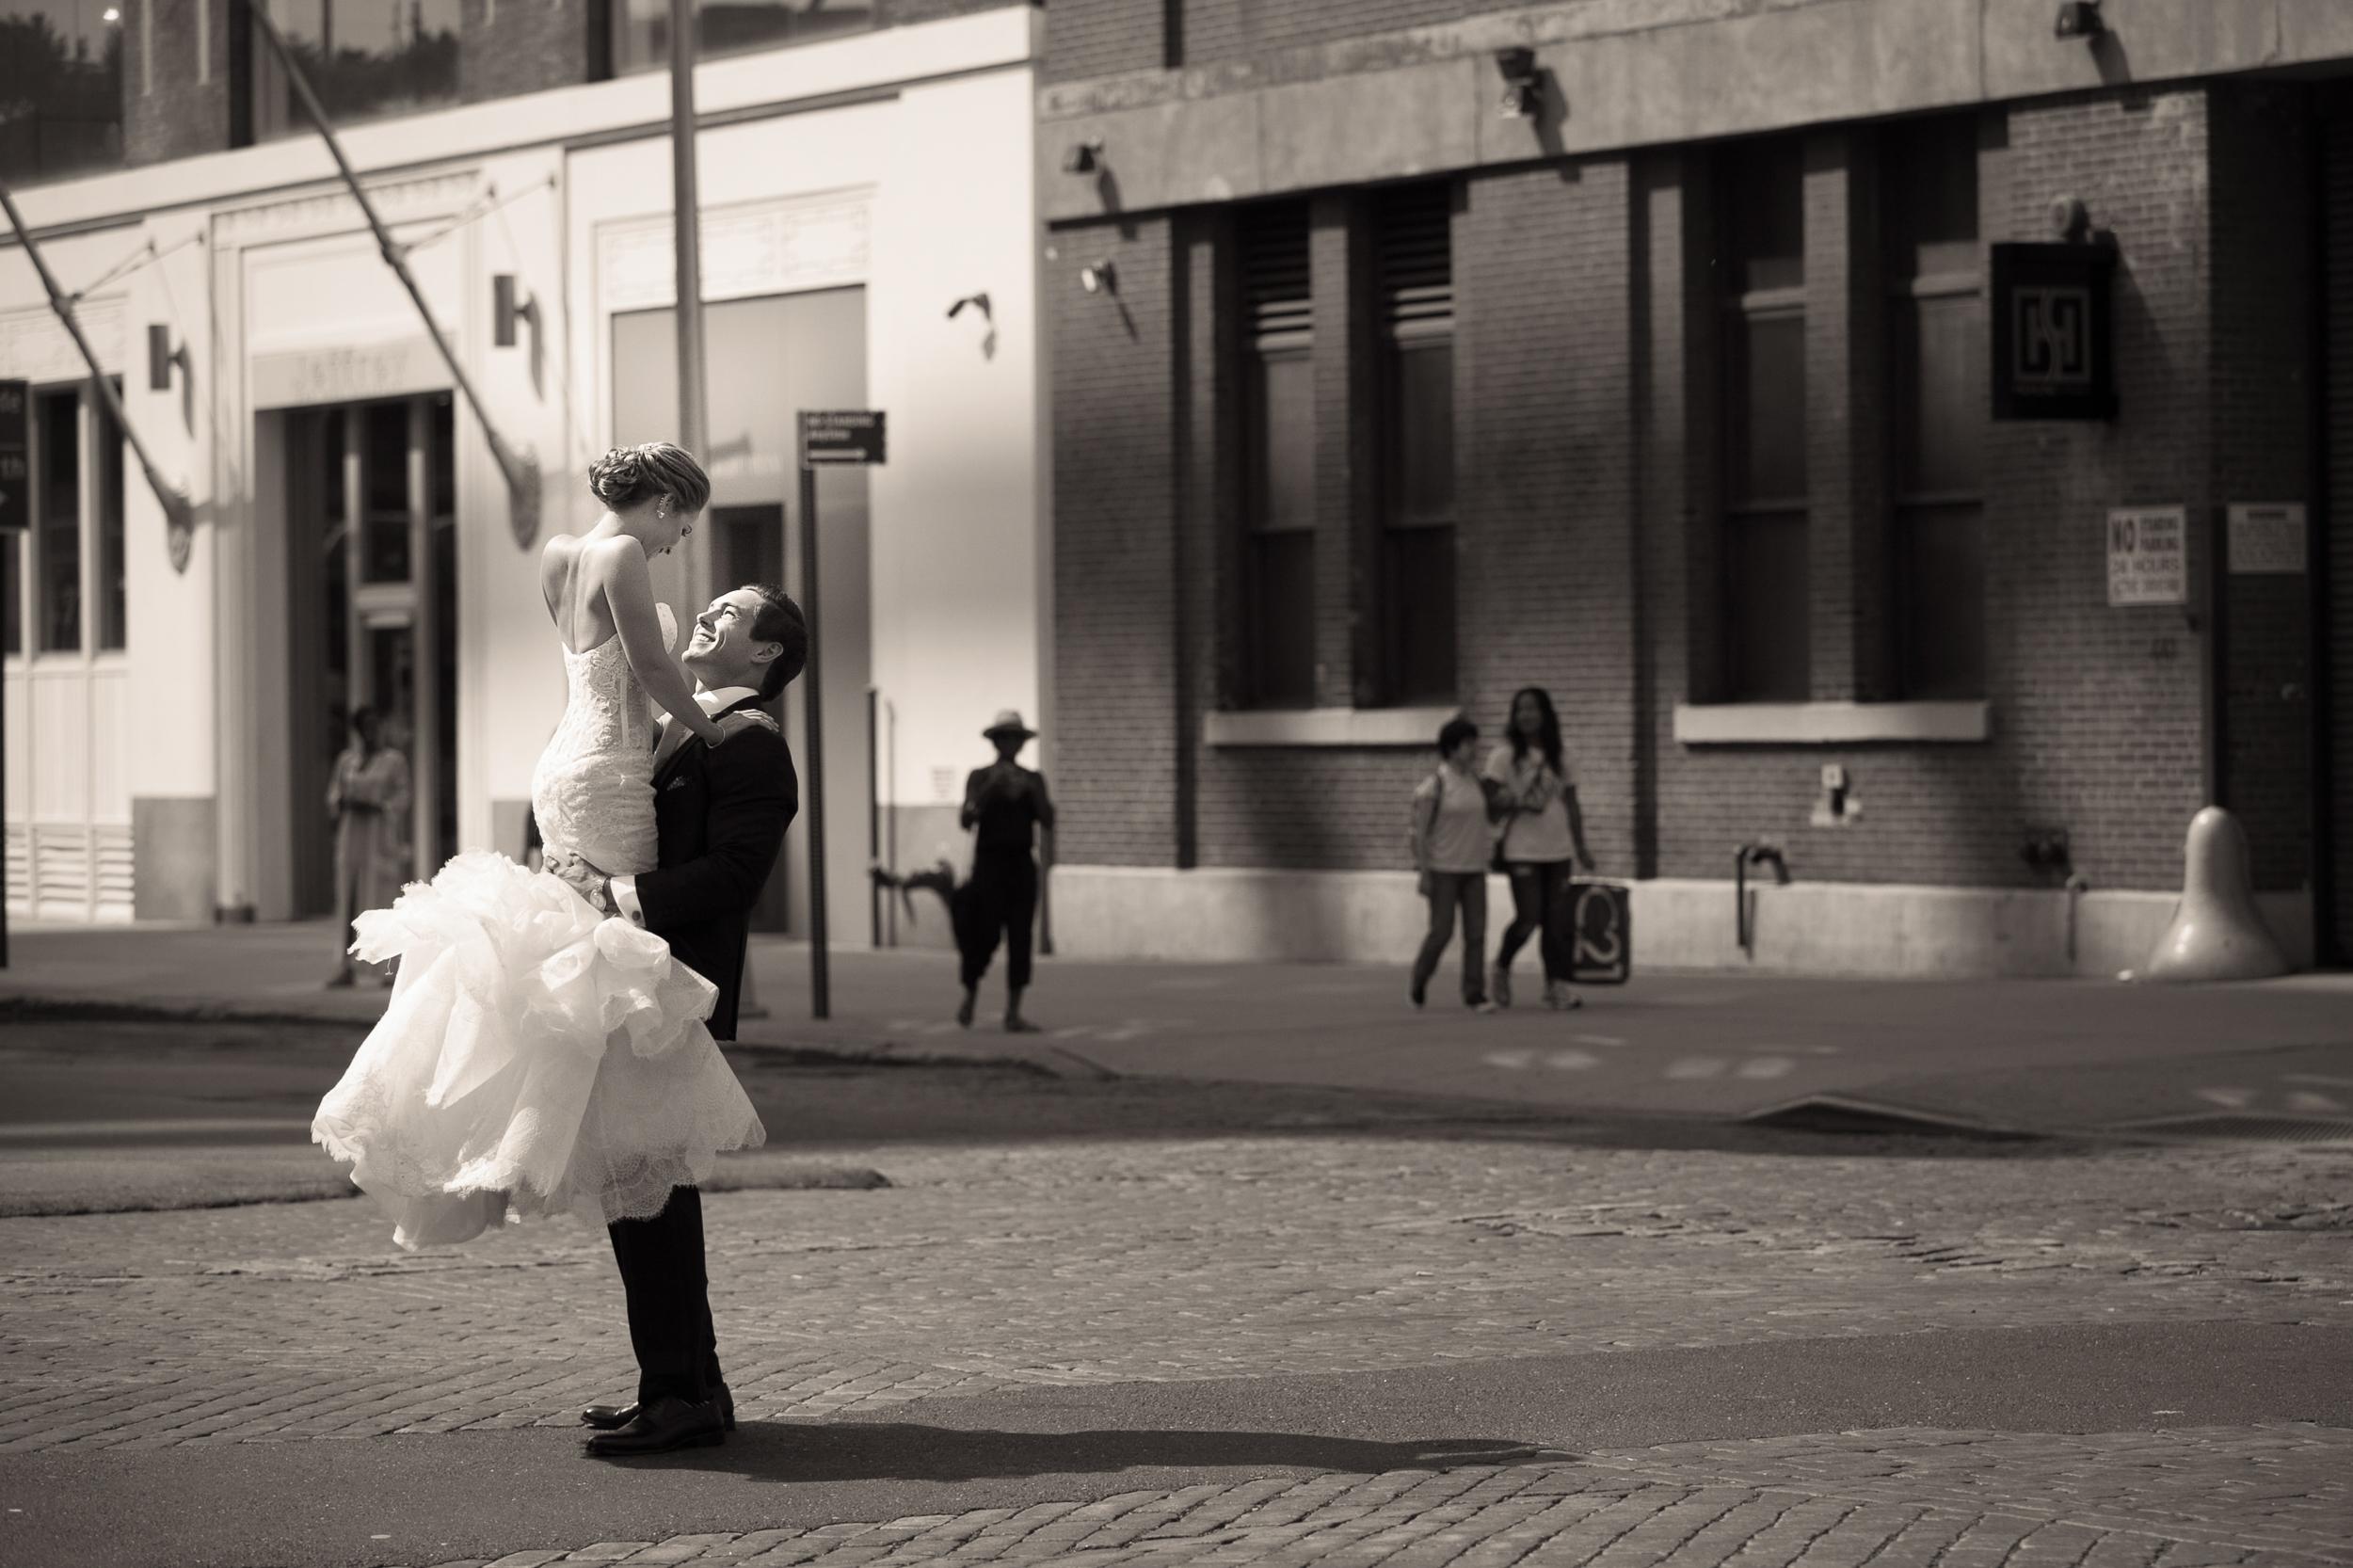 Ceci_New_York_Style_Luxury_Custom_Summer_Wedding_CeciBride_Letterpress_NewYork_Foil_Lighthouse_Chelsea_Piers_20.jpg